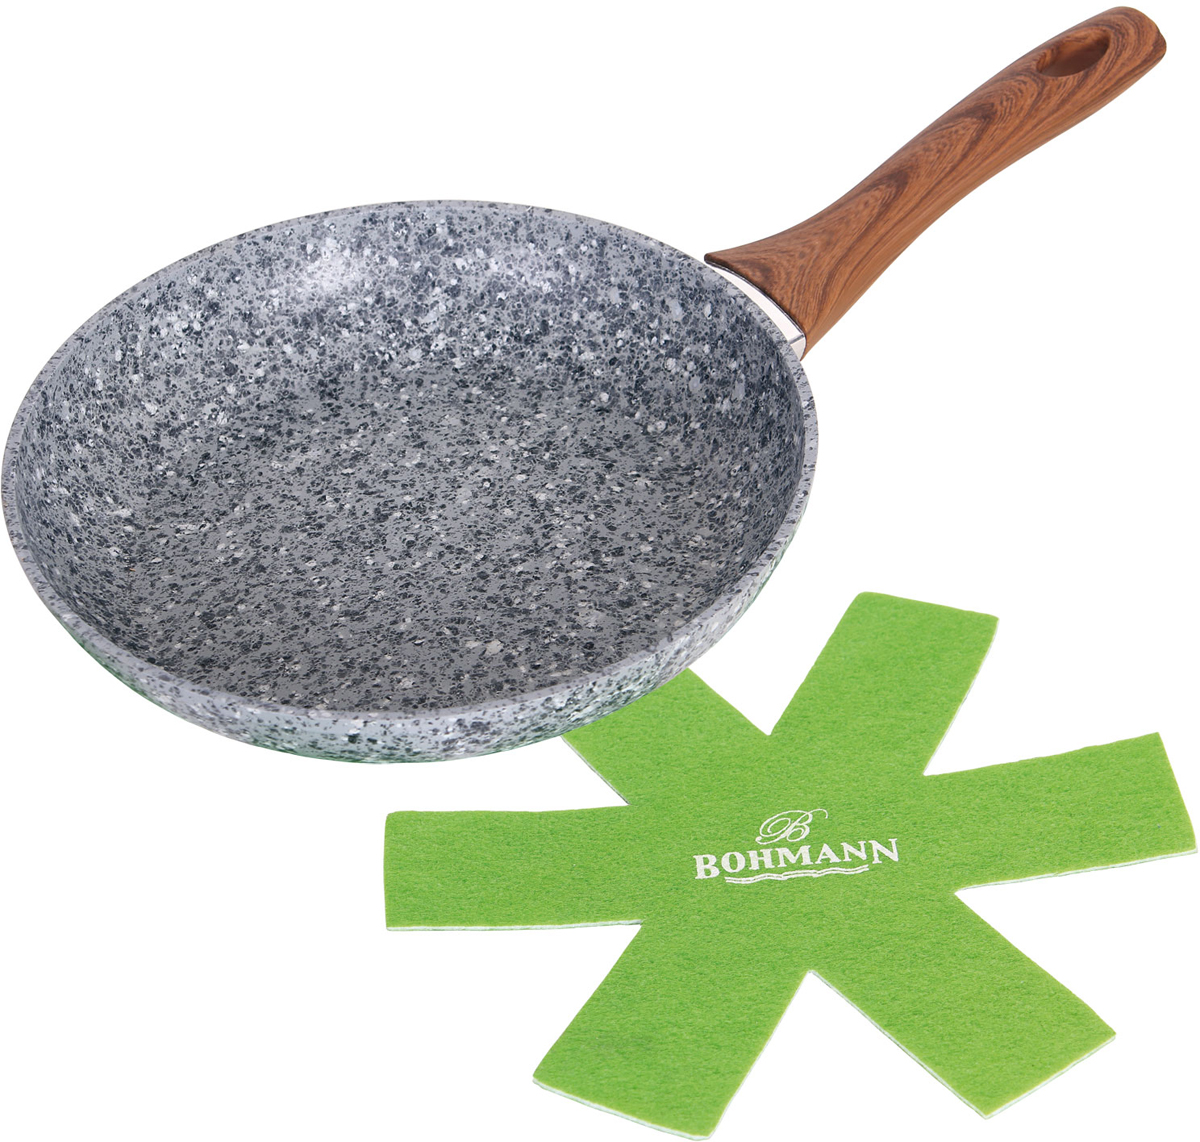 Сковорода Bohmann, с подставкой, цвет: серый. Диаметр 26 см. 1015-26BHGRN сковорода bohmann 372124вн серый диаметр 24 см